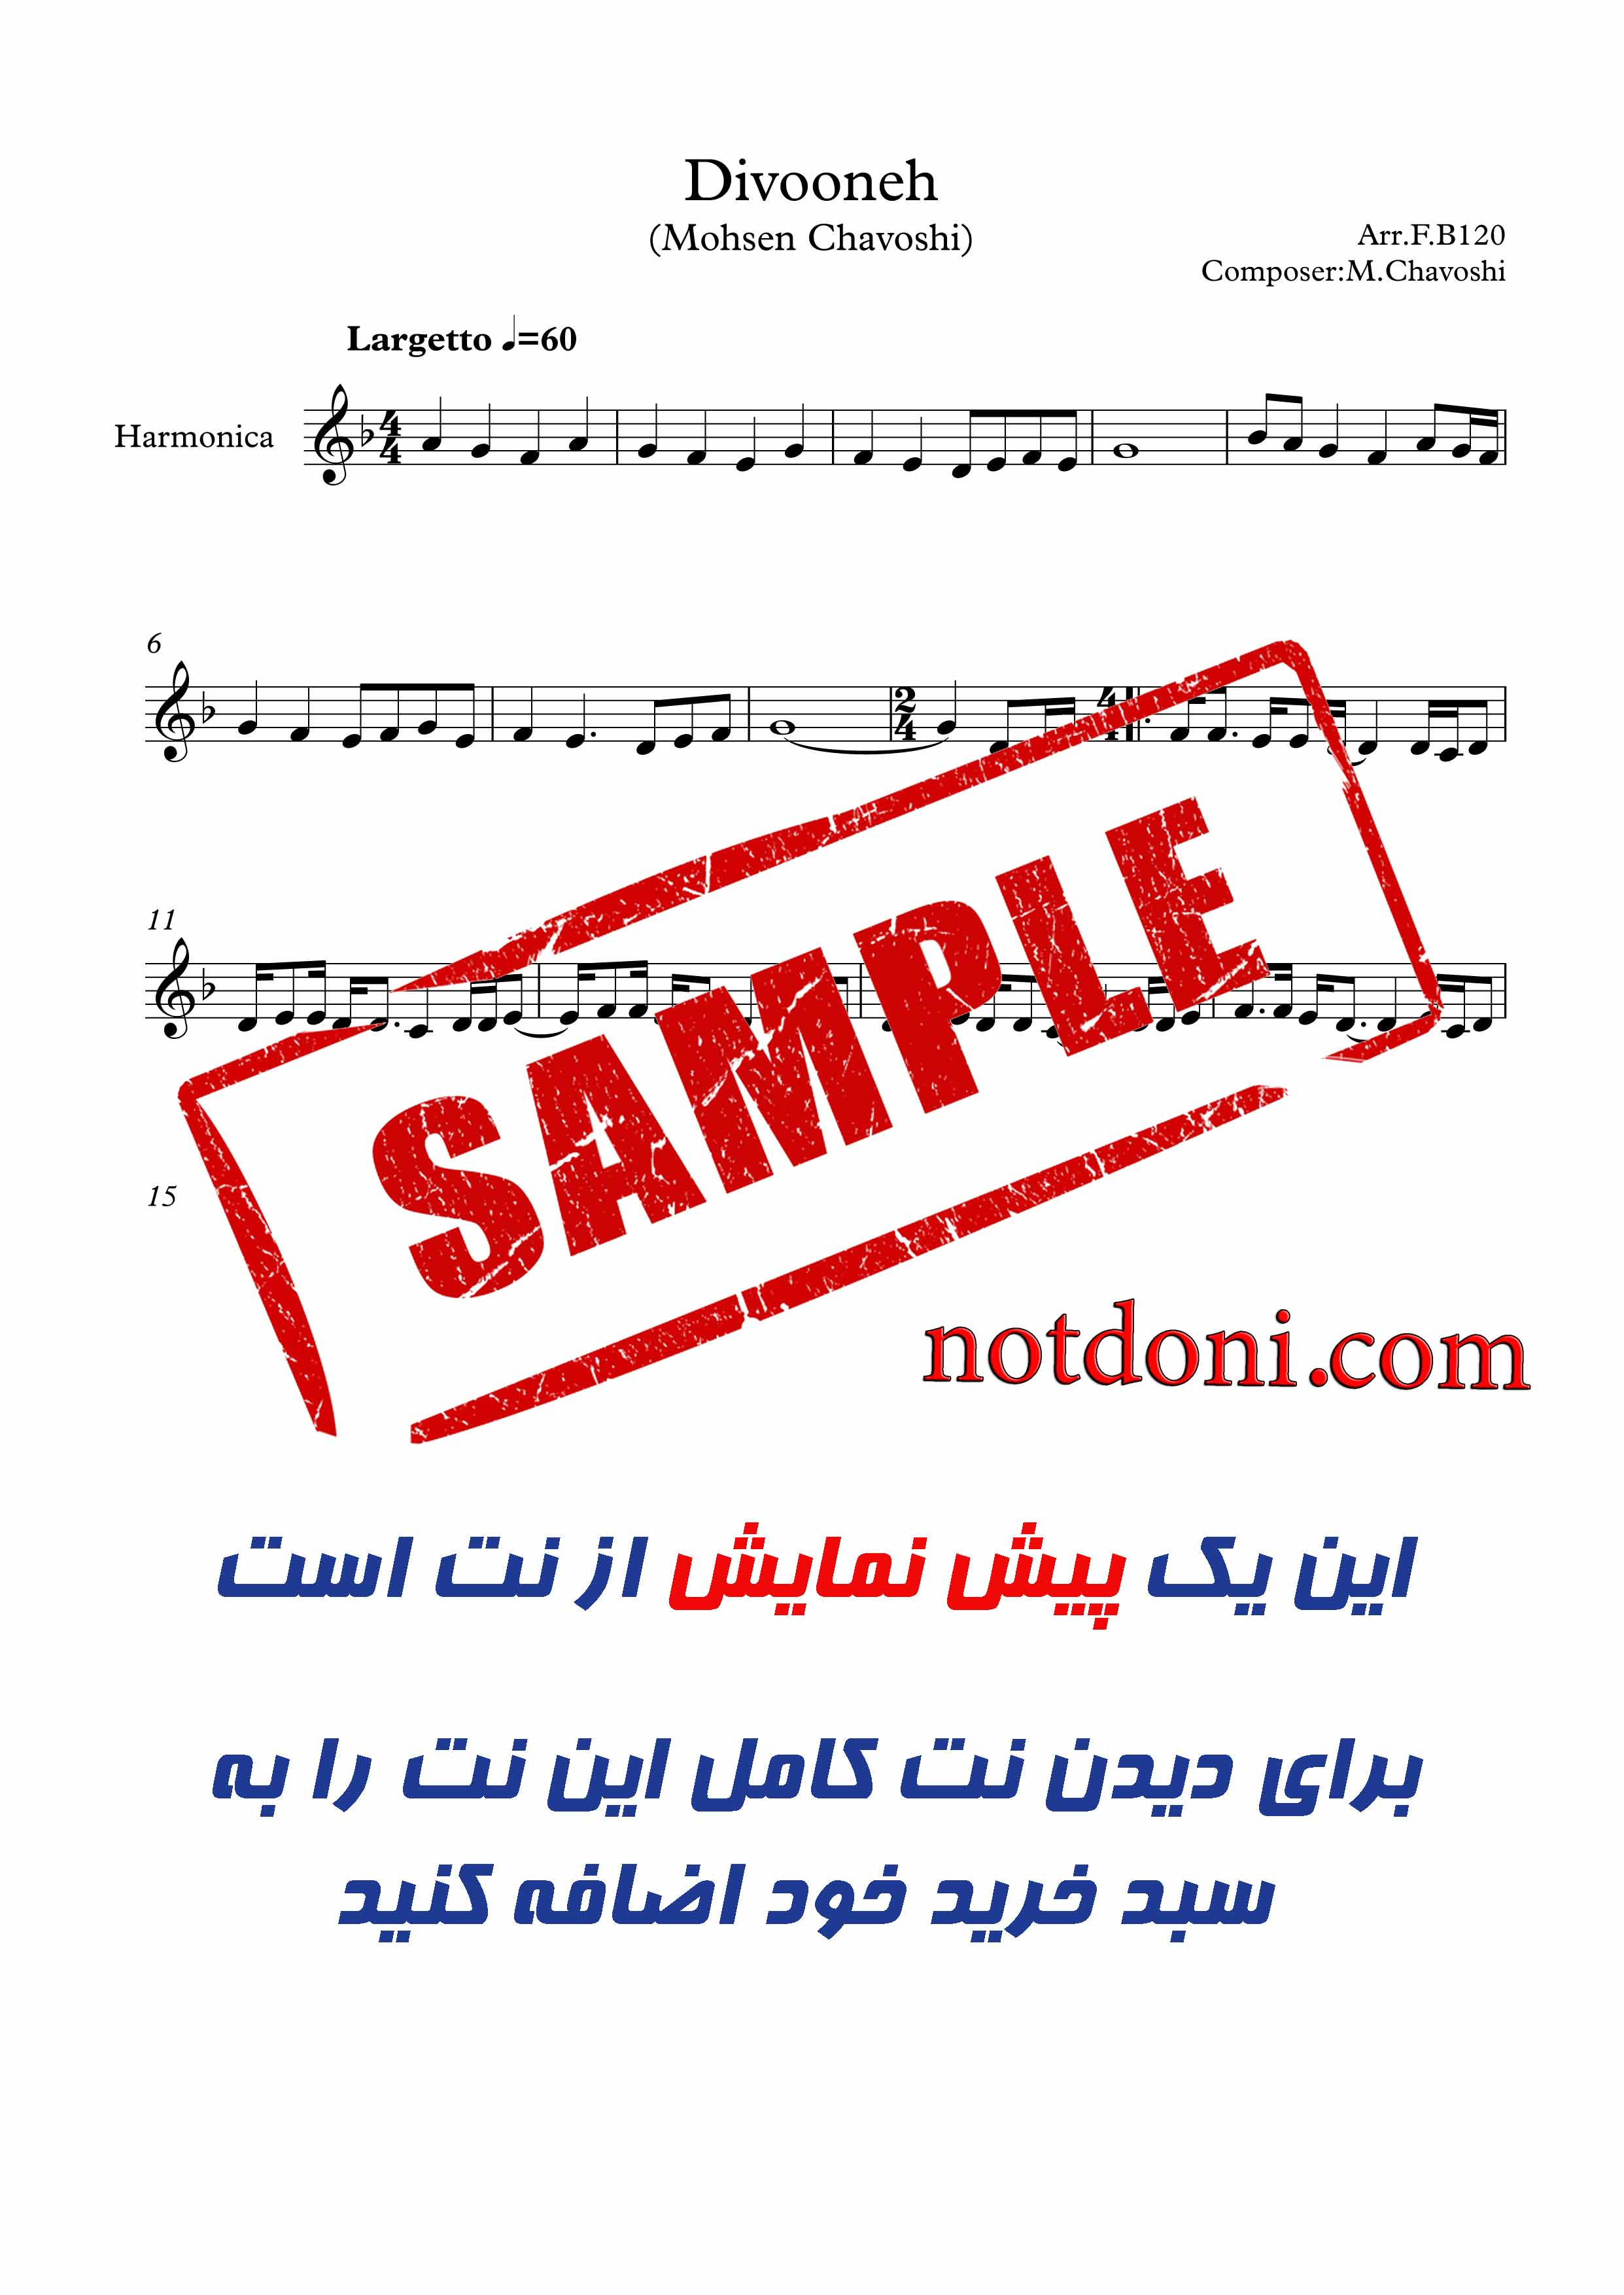 89e30844-01d8-4fea-90d5-da728dfc6dc8_دموی-نت-آهنگ-دیونه-هارمونیکا.jpg